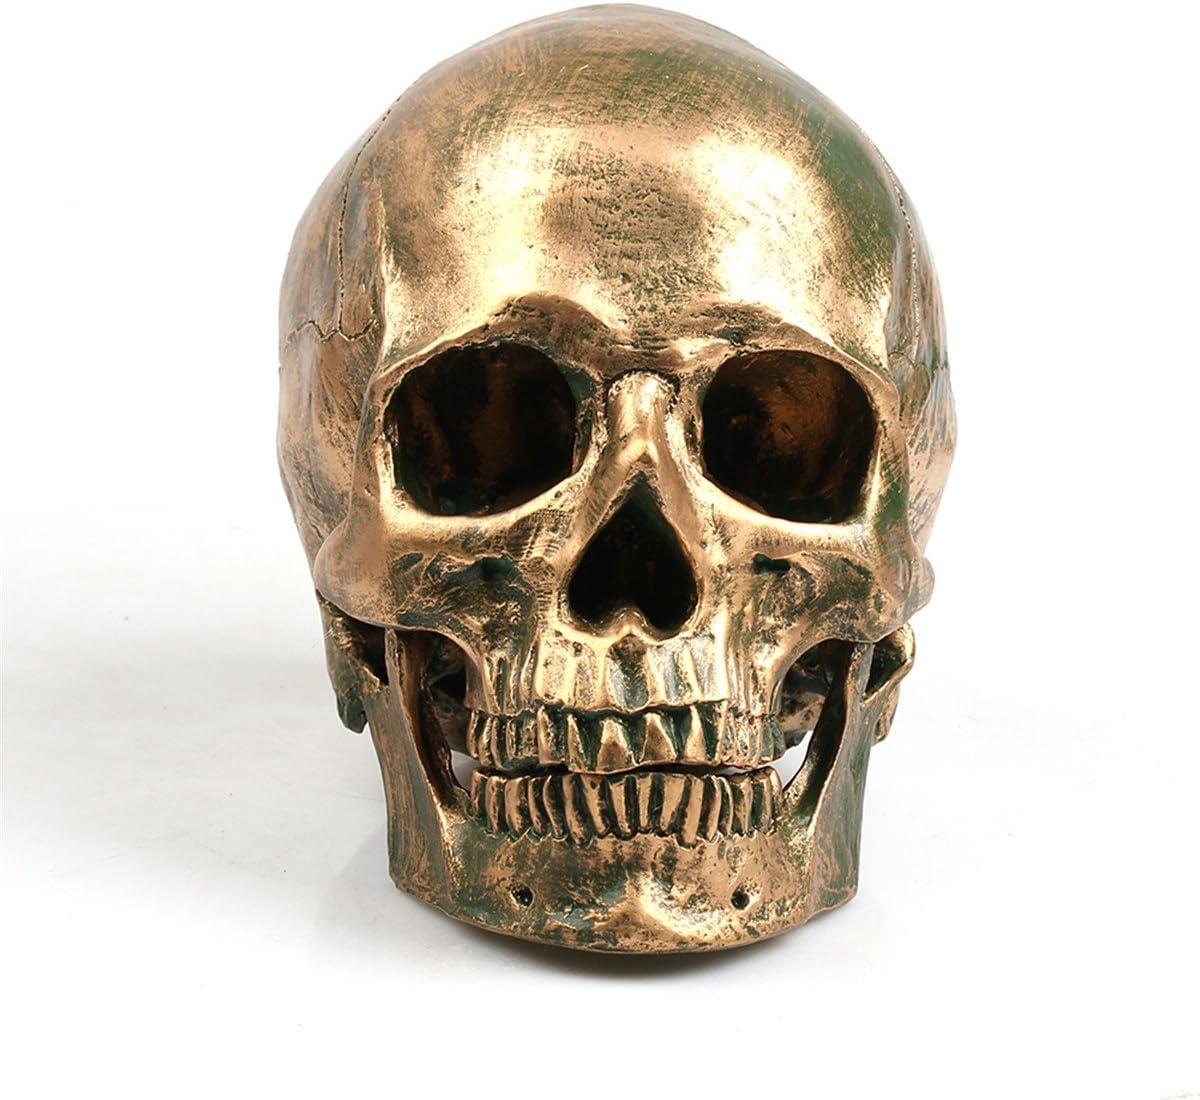 ECYC 1:1 Resin Human Skull Model Halloween Props Home Decorations High Fidelity Bronze Skulls